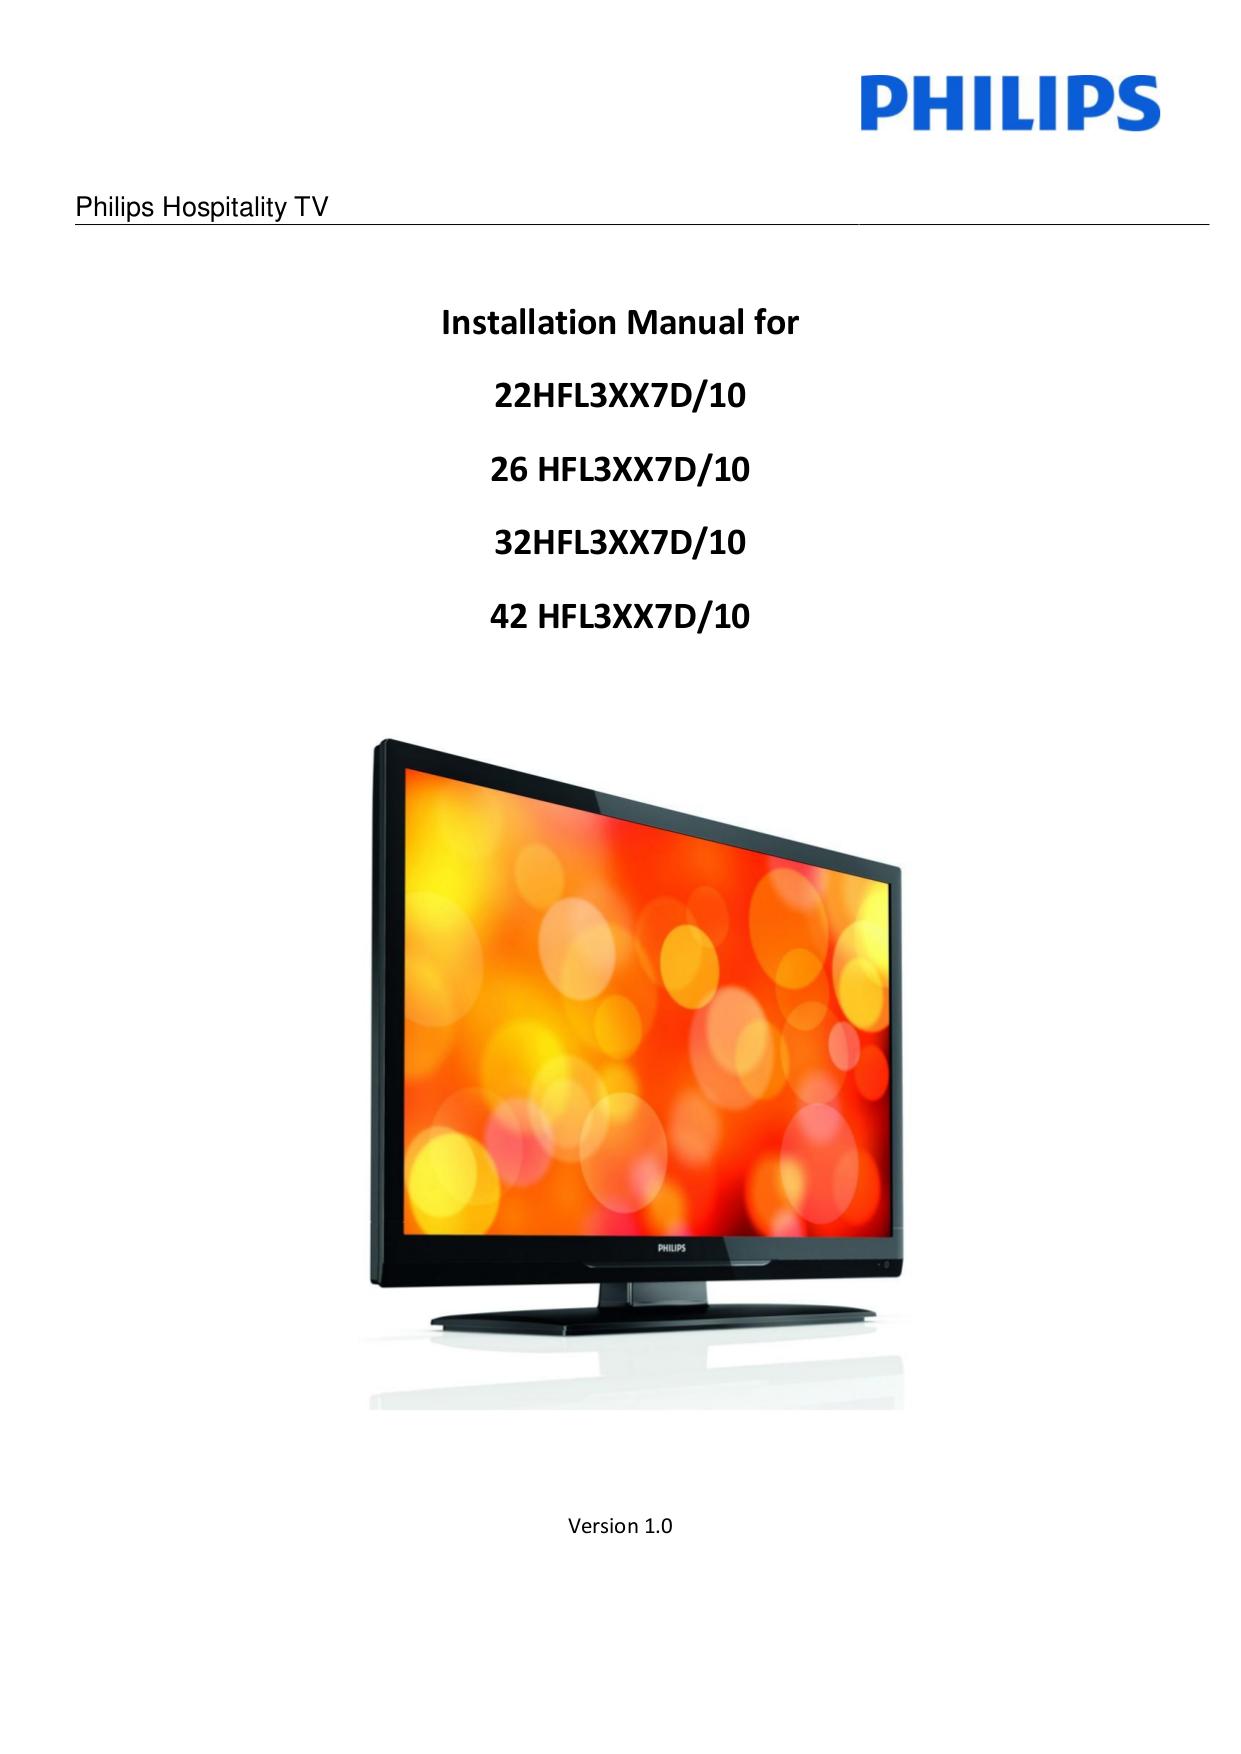 Philips Hospitality Tv Manual